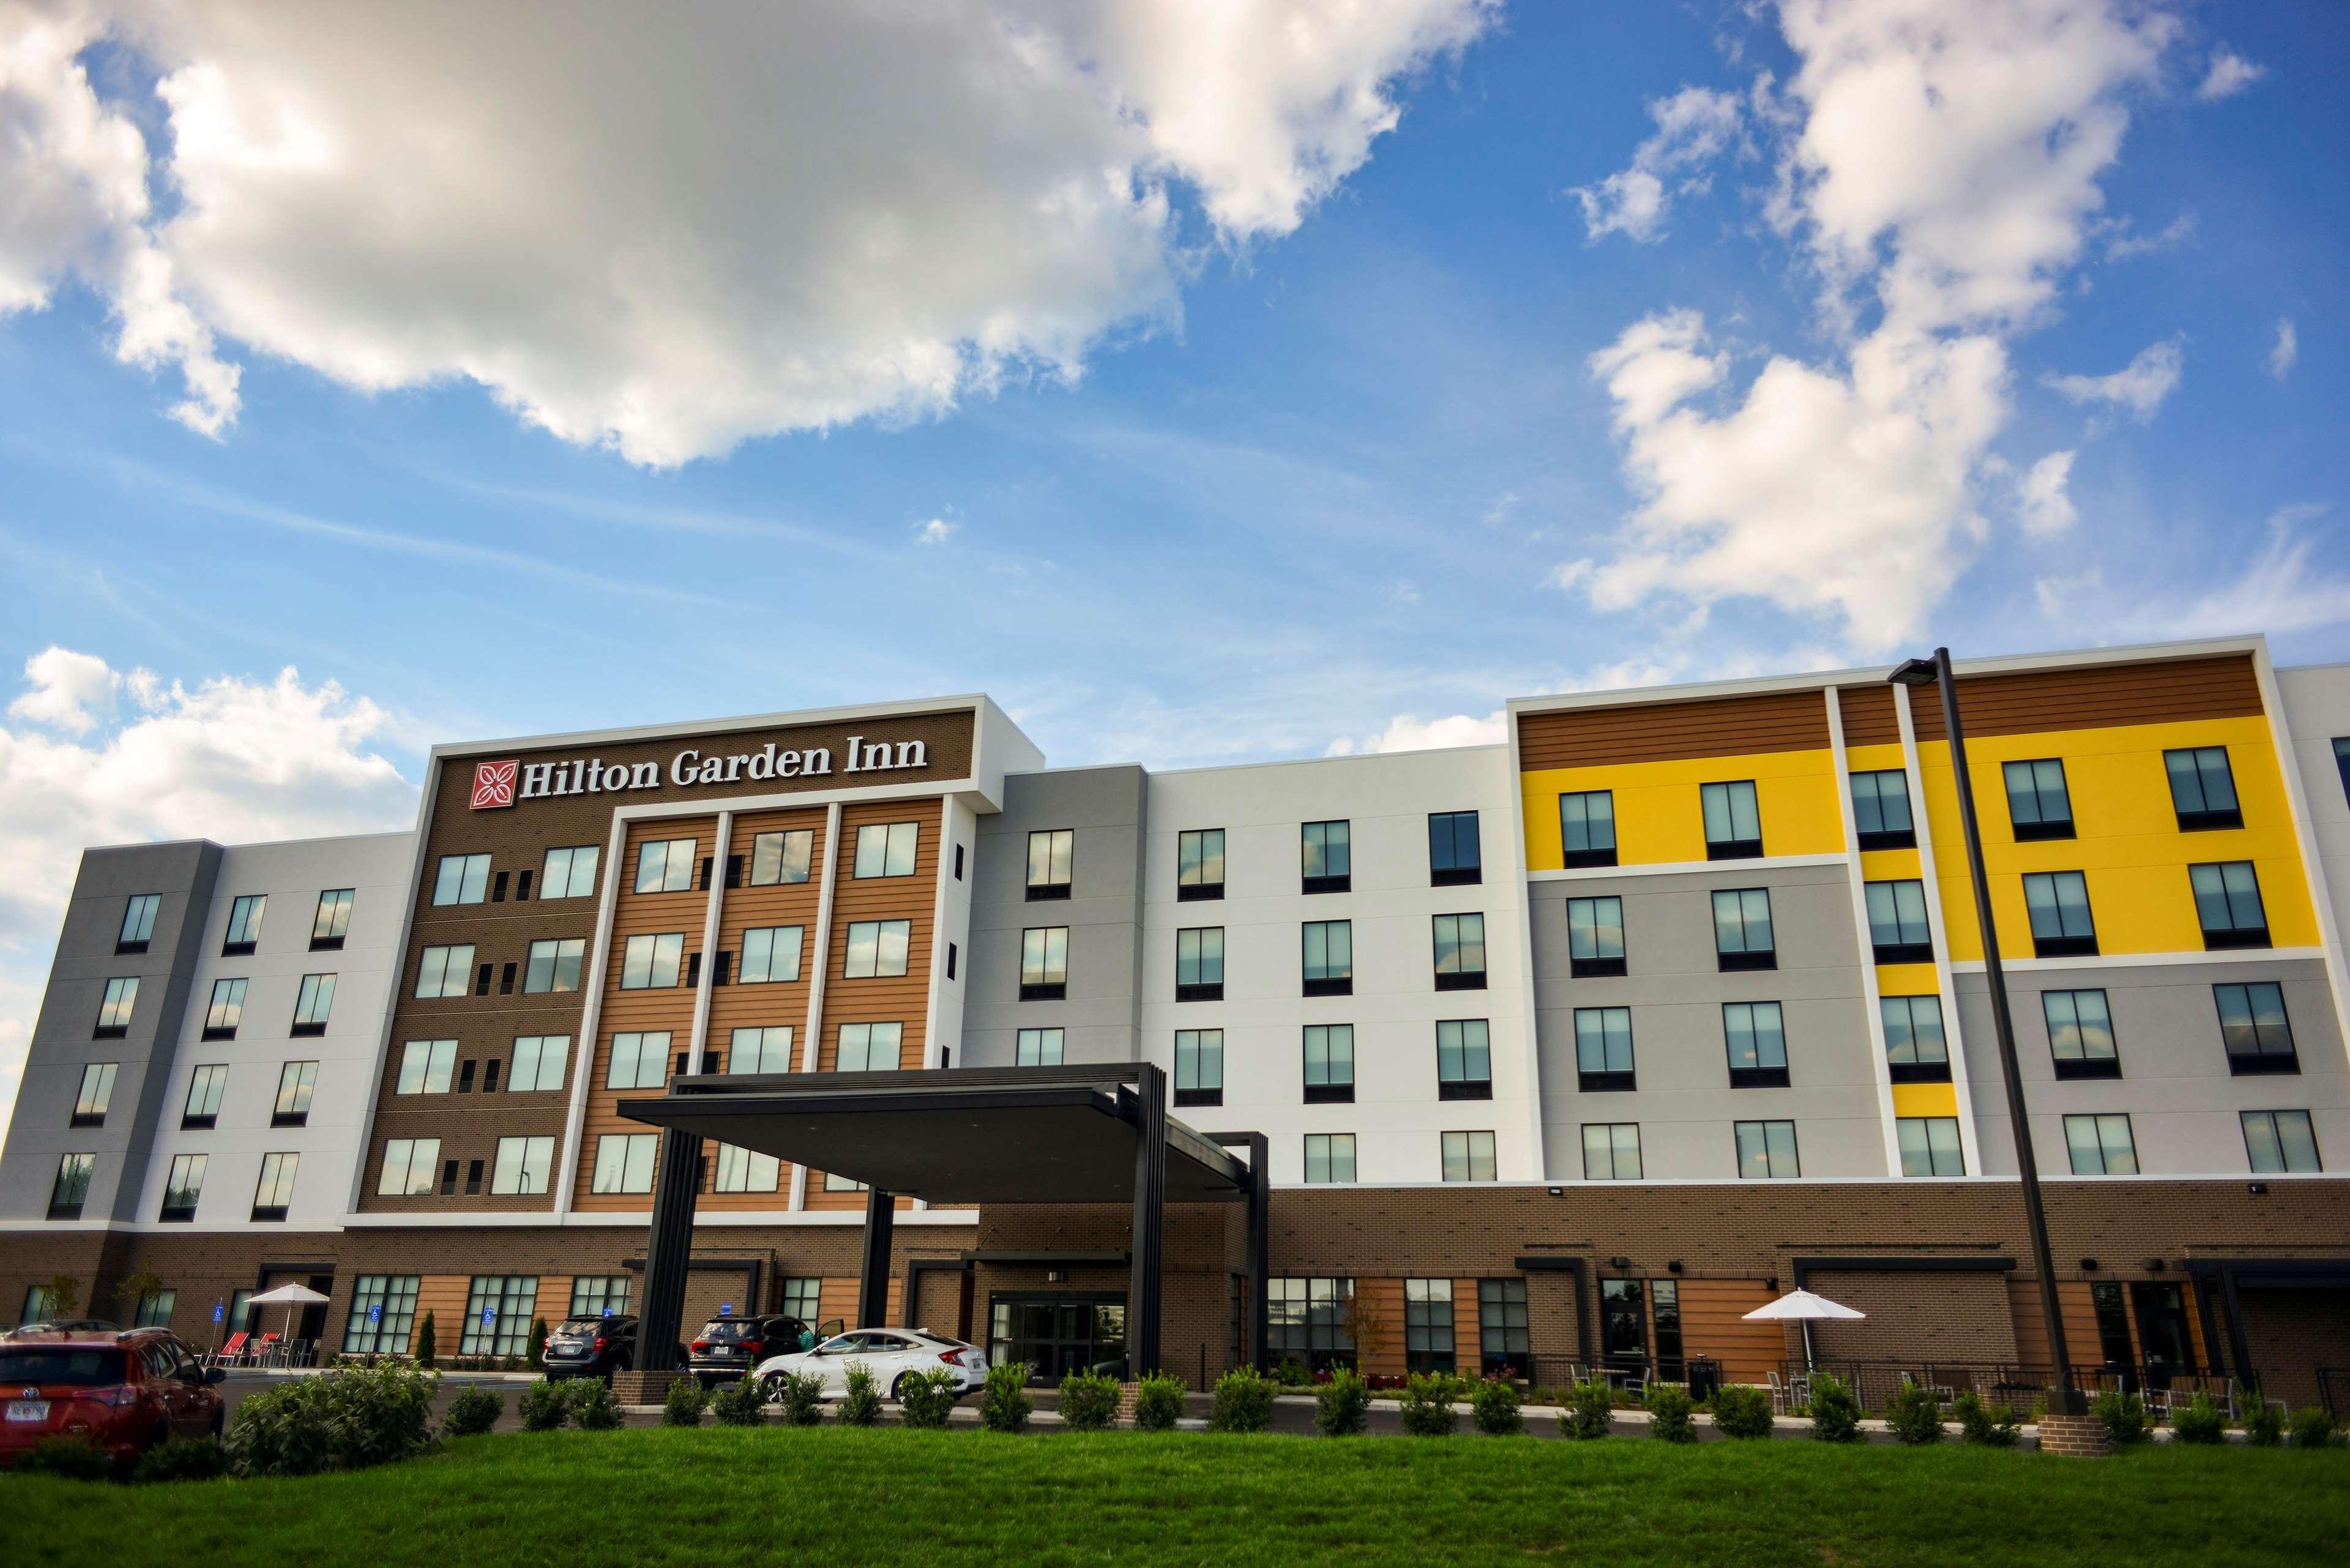 Hilton Garden Inn Louisville Mall Of St Matthews Louisville Kentucky Ky